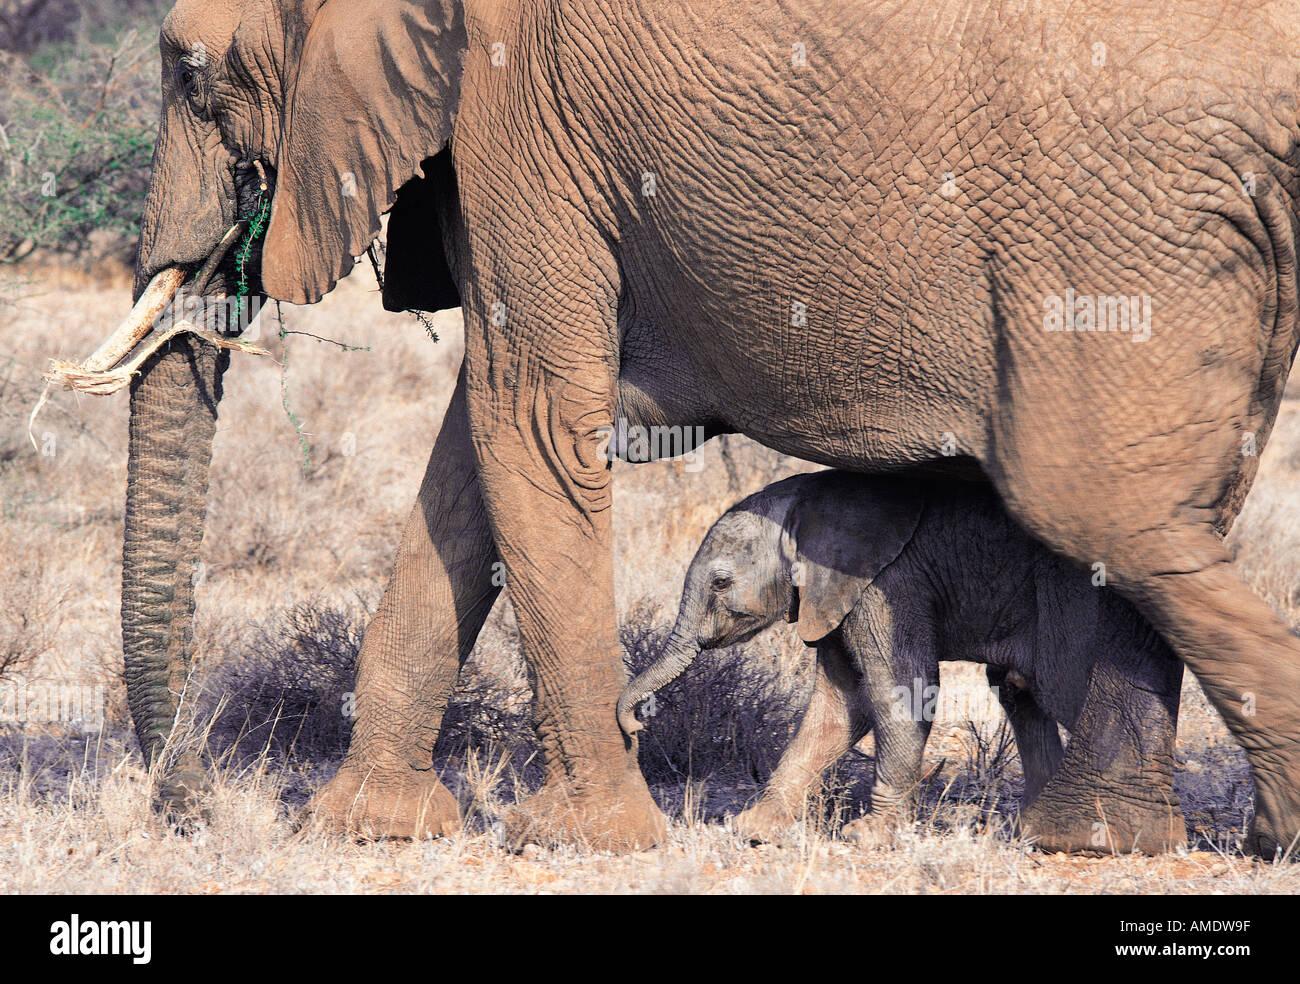 Female elephant sheltering tiny baby between her legs Samburu National Reserve Kenya East Africa - Stock Image